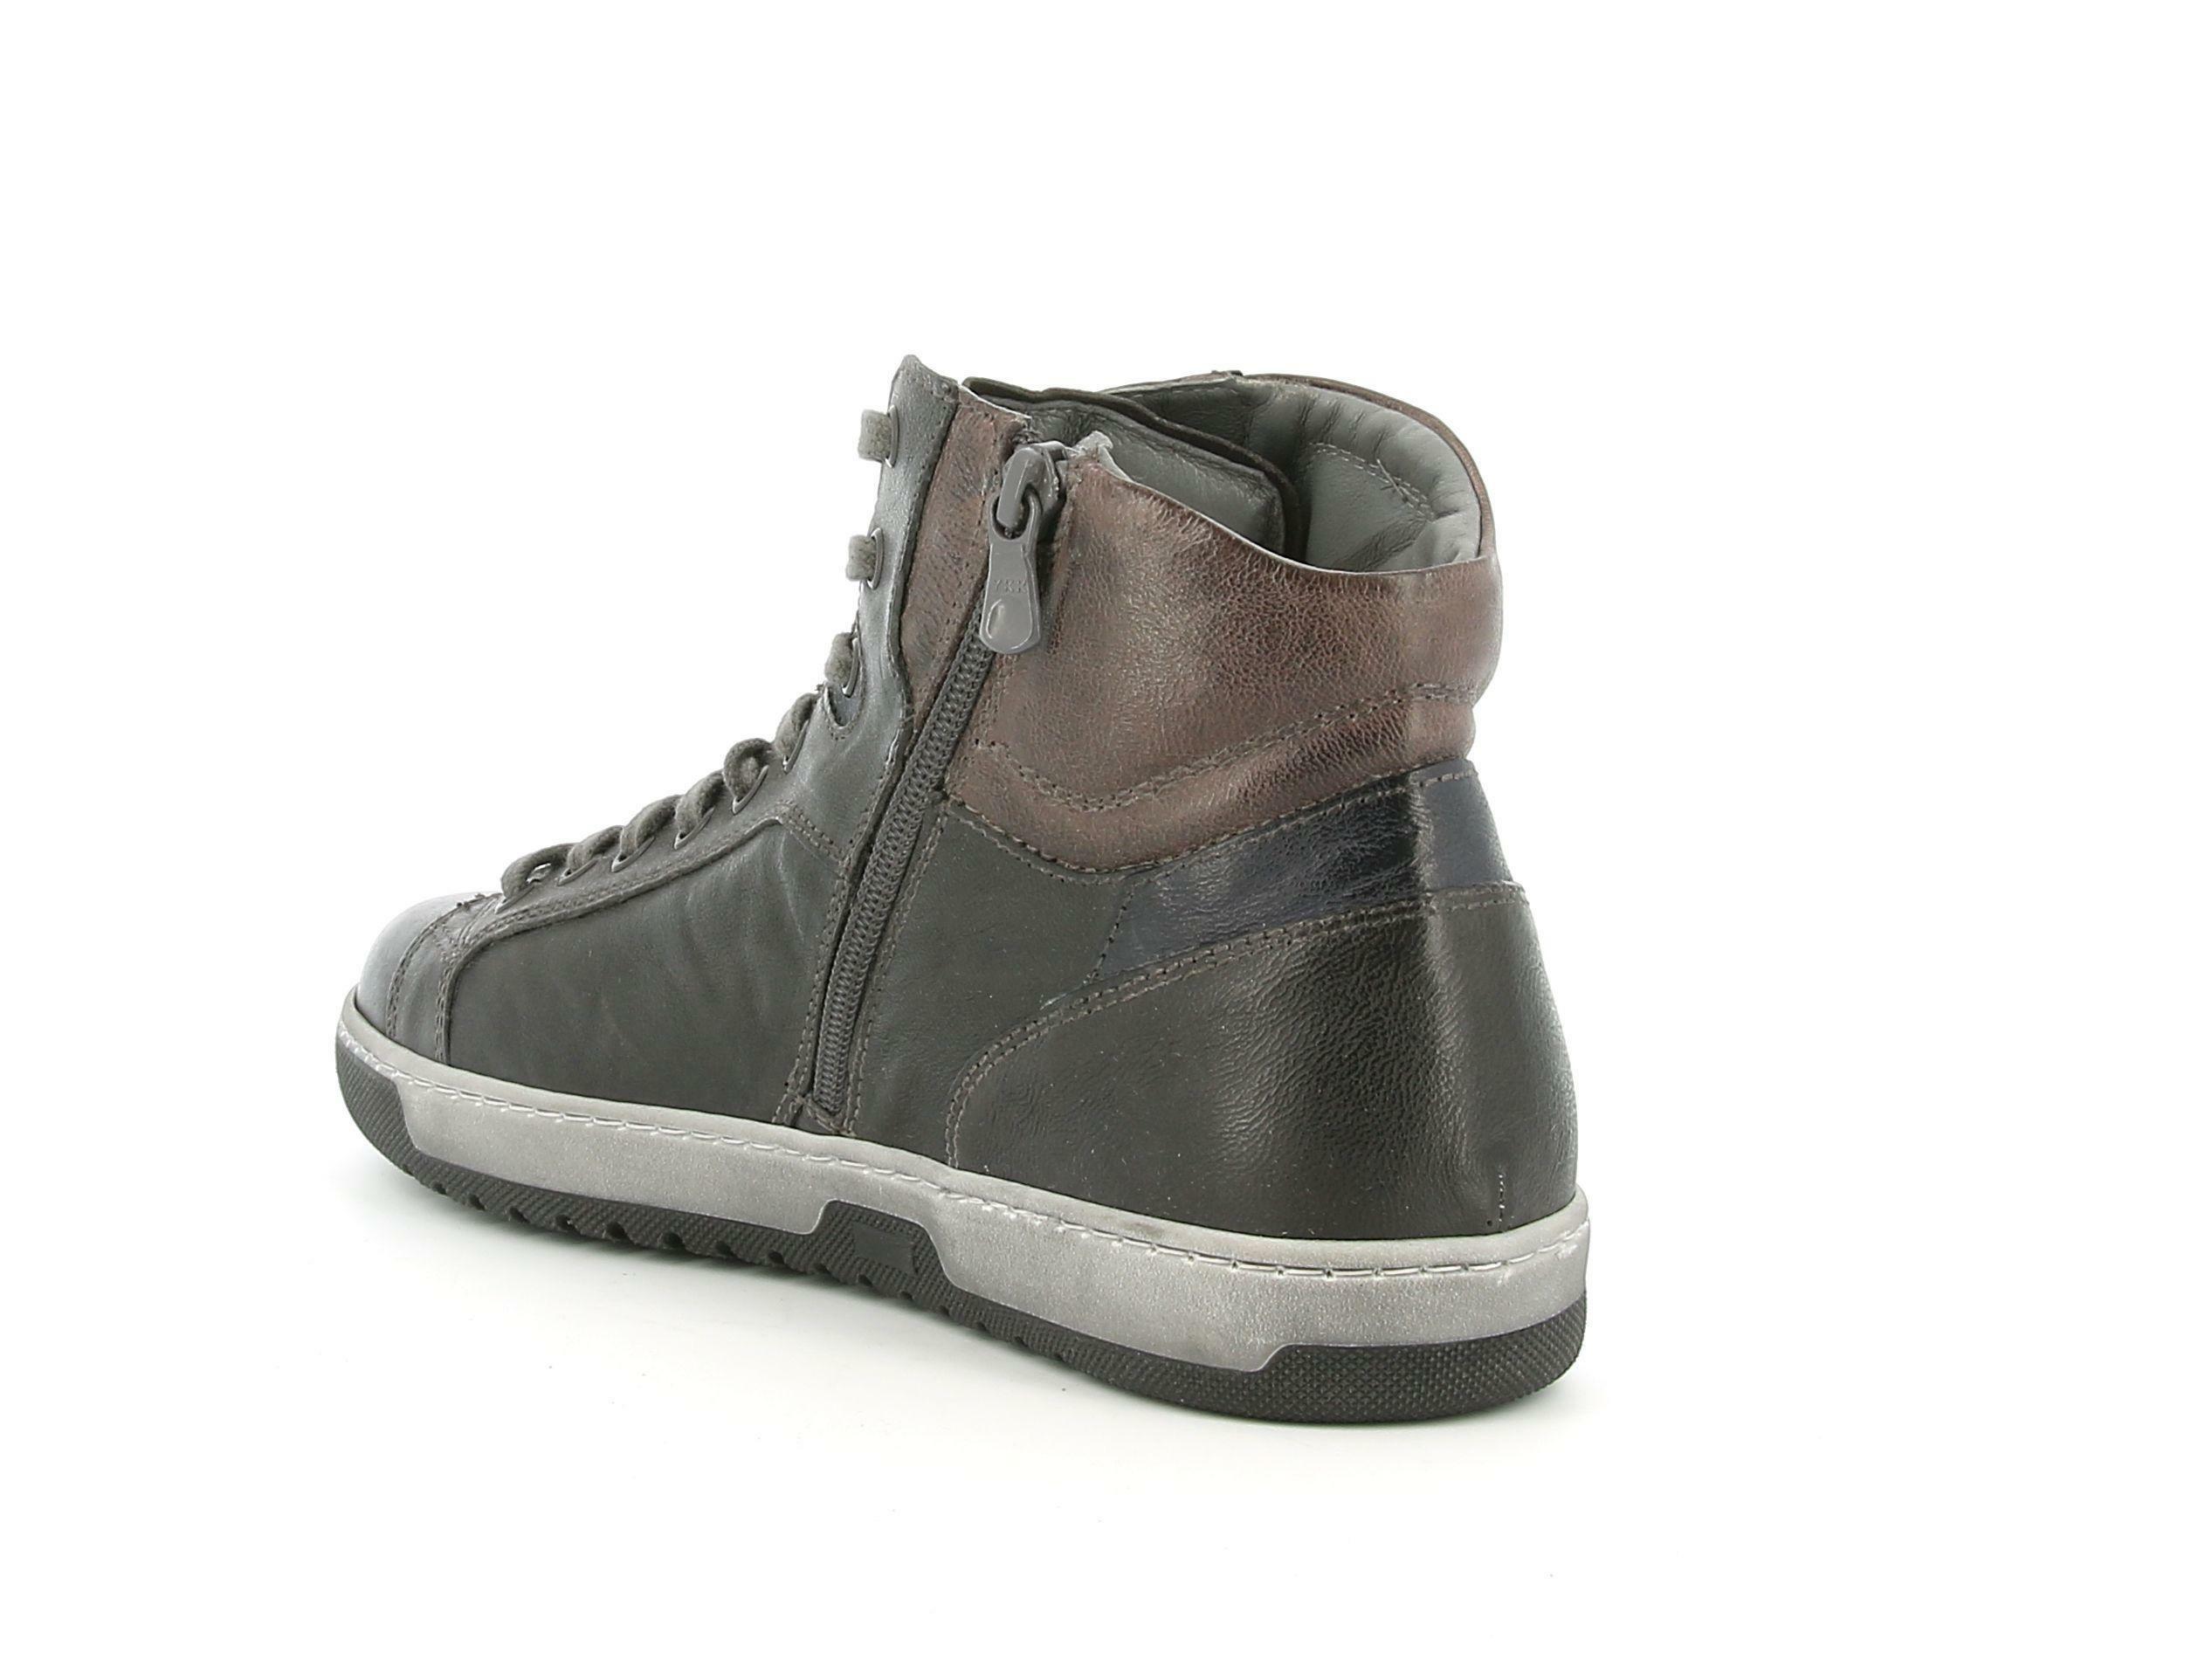 nero giardini nero giardini nero giadrini i001731u 109 grigio sneakers alta uomo